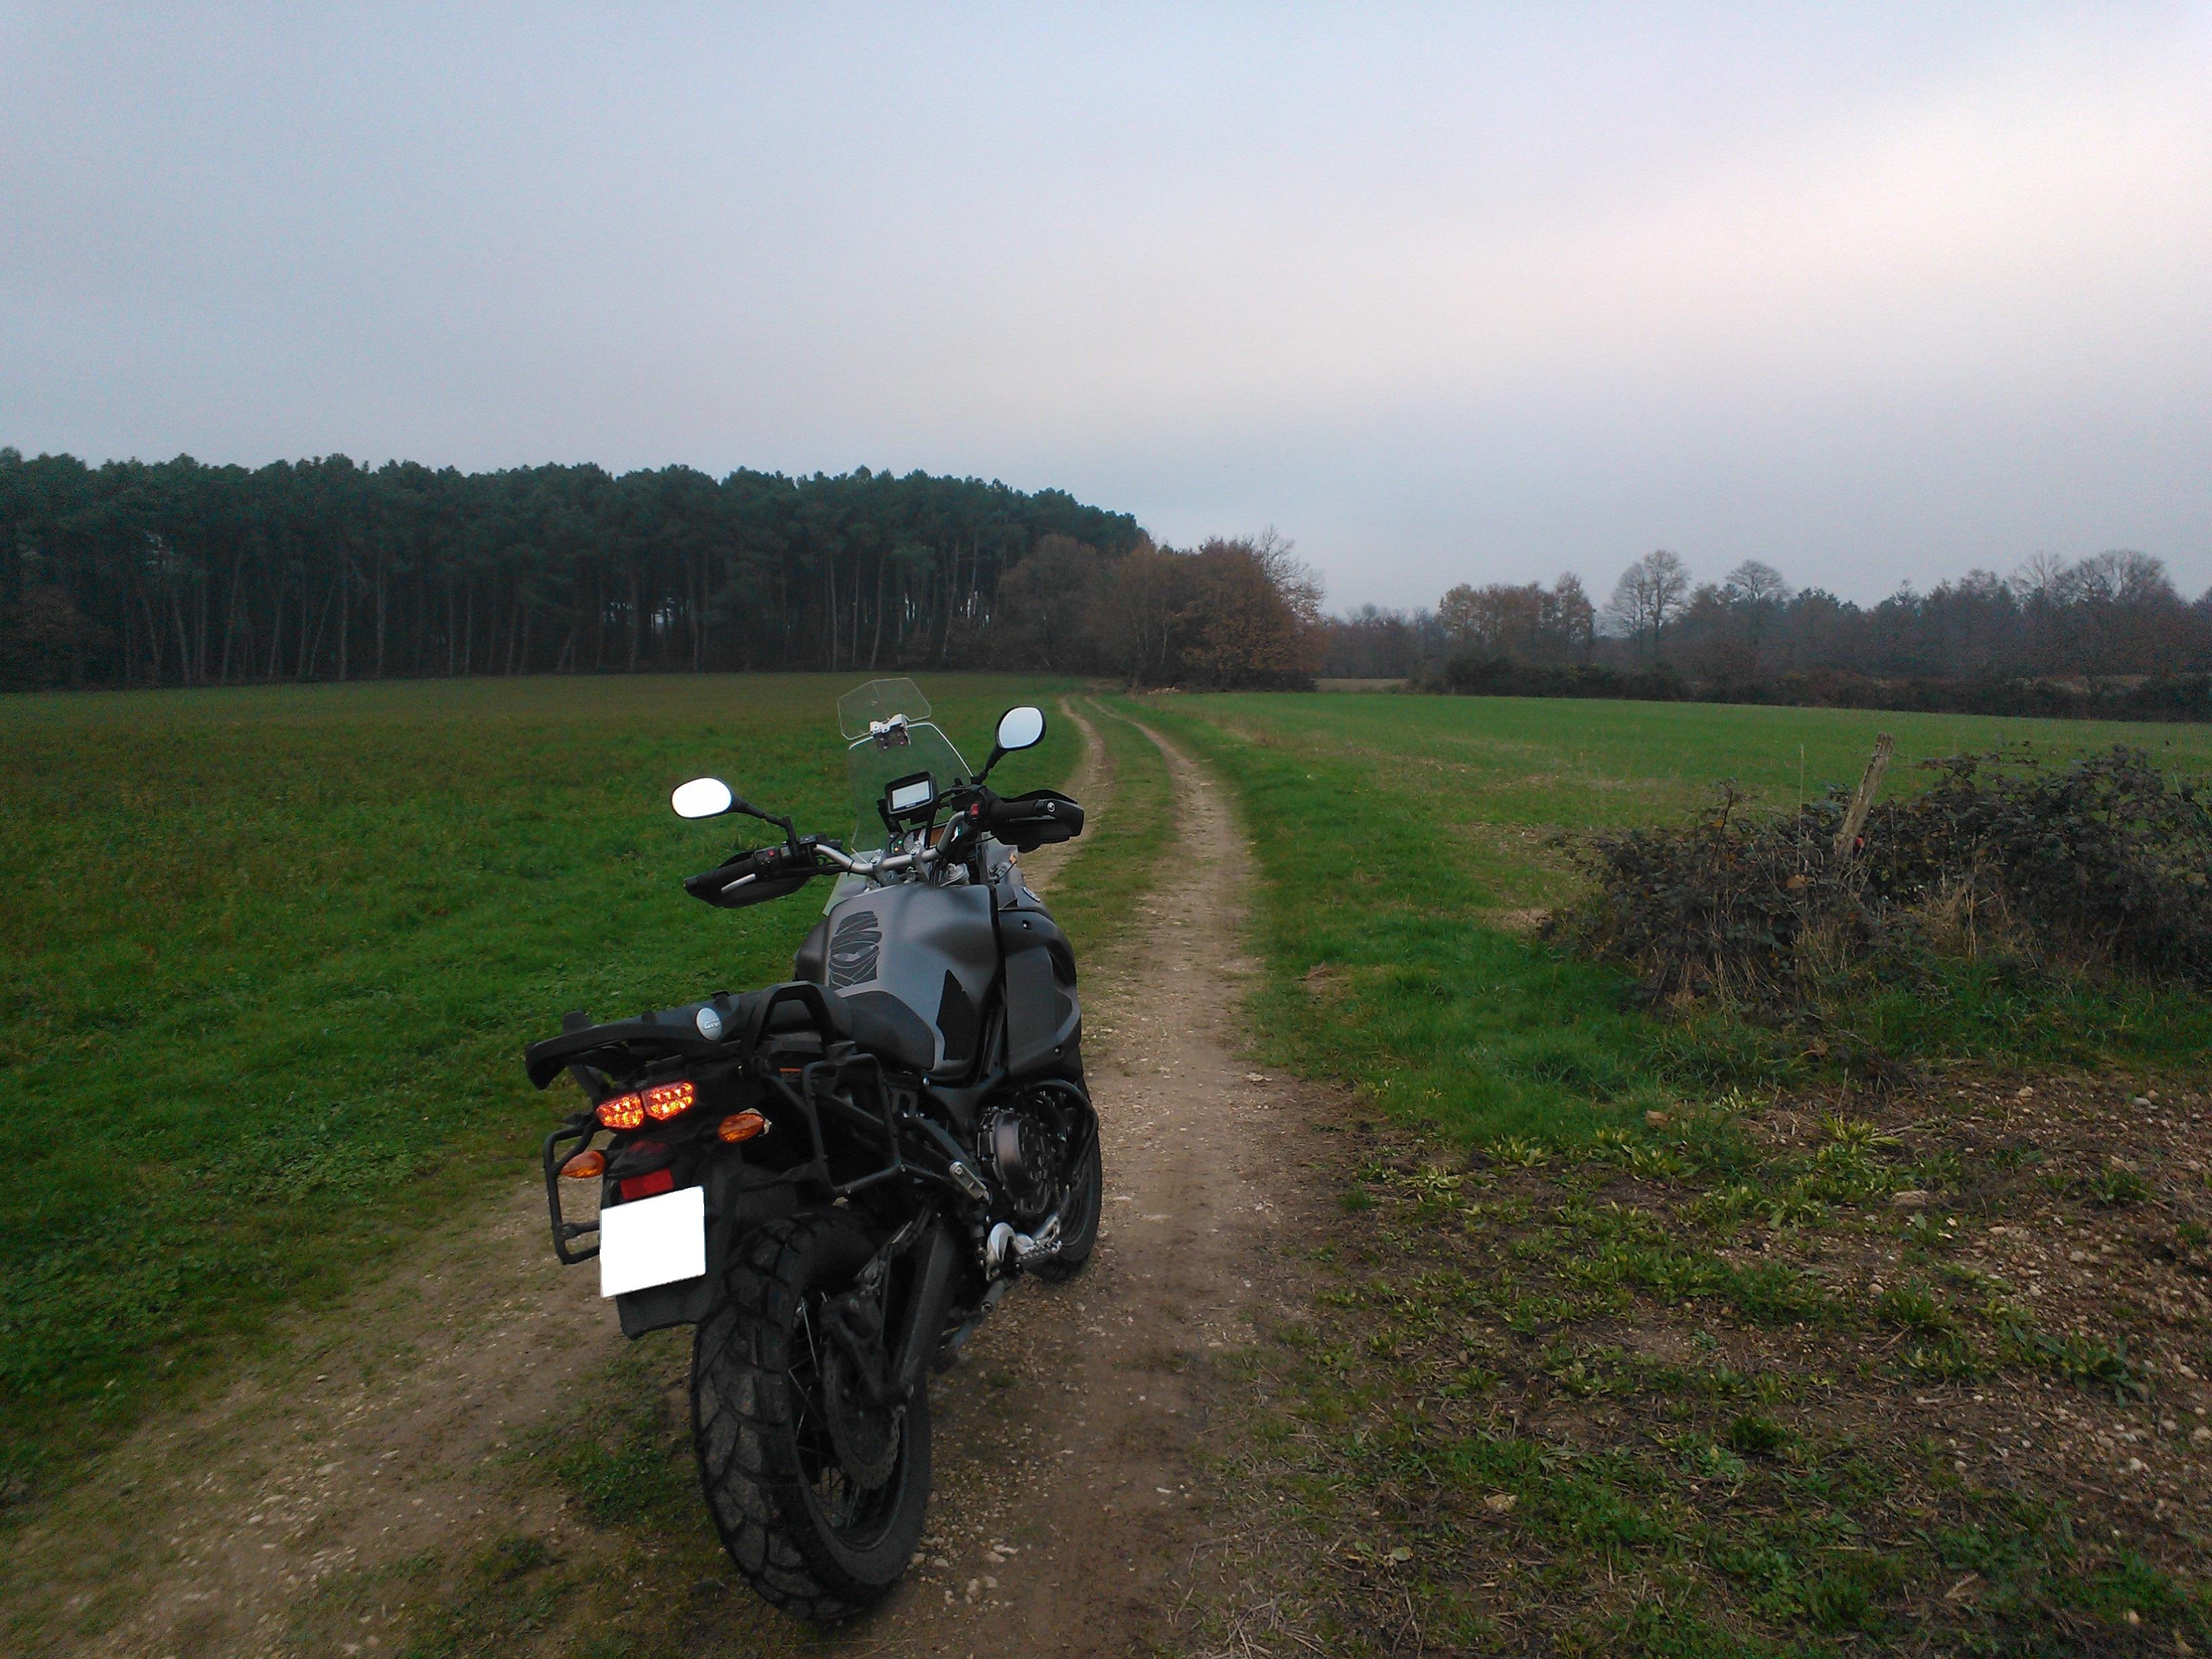 Balade dans les champs en Bretagne 492363WP201411303